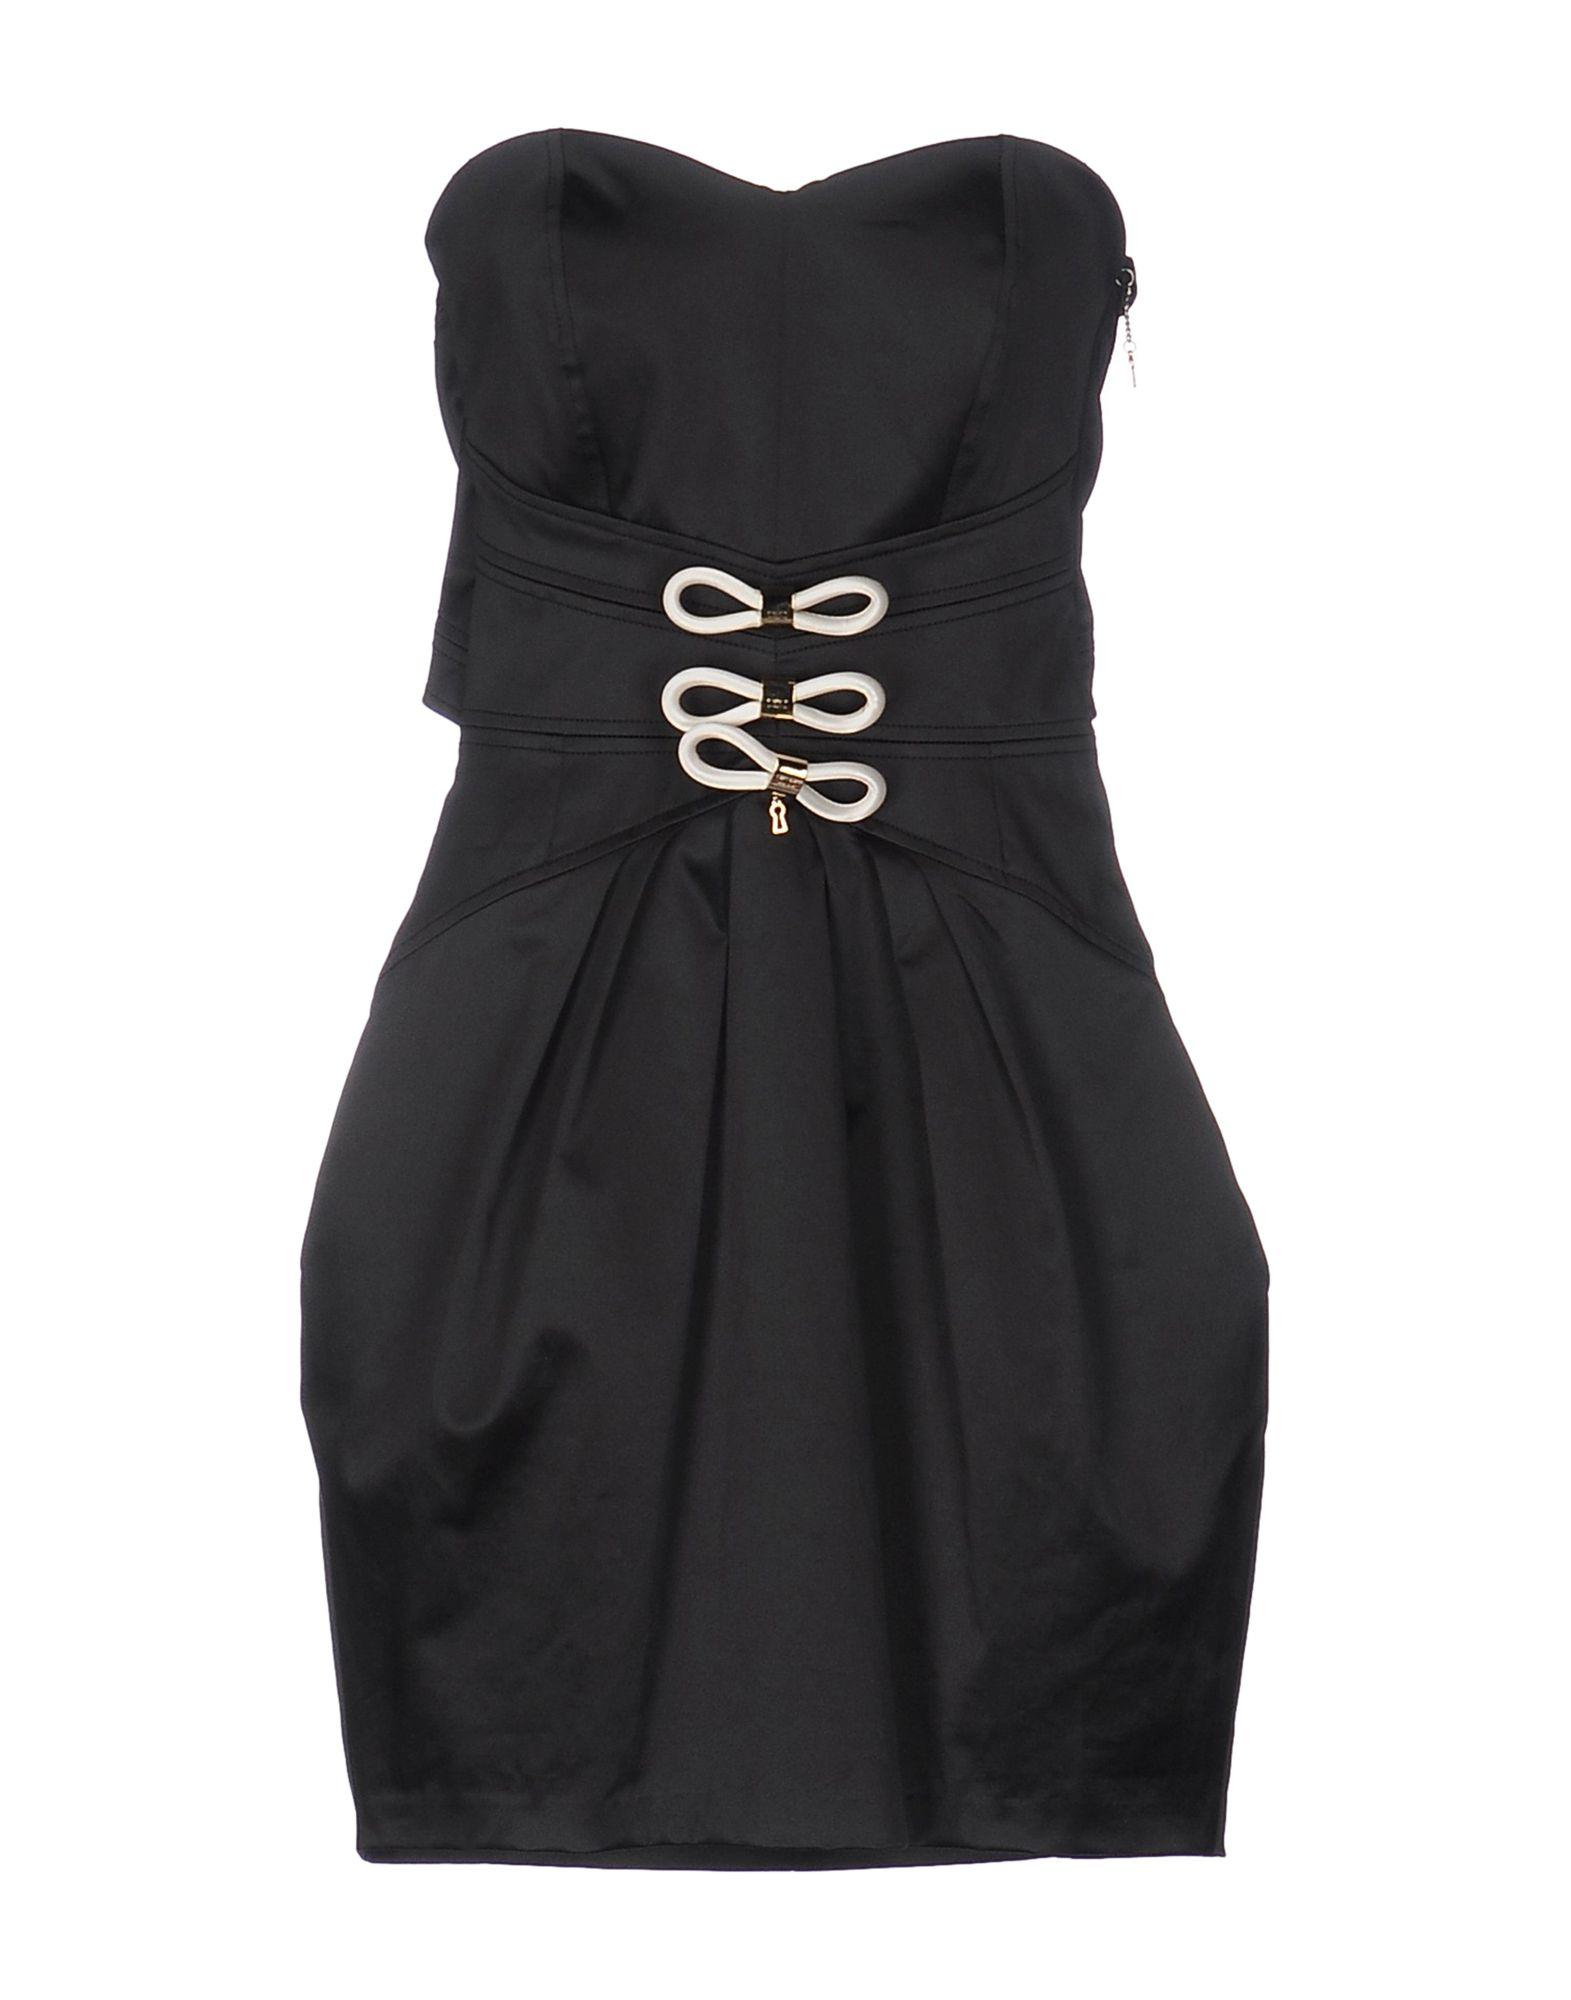 PASSEPARTOUT DRESS by ELISABETTA FRANCHI CELYN b. Короткое платье платье quelle b c best connections by heine 3968